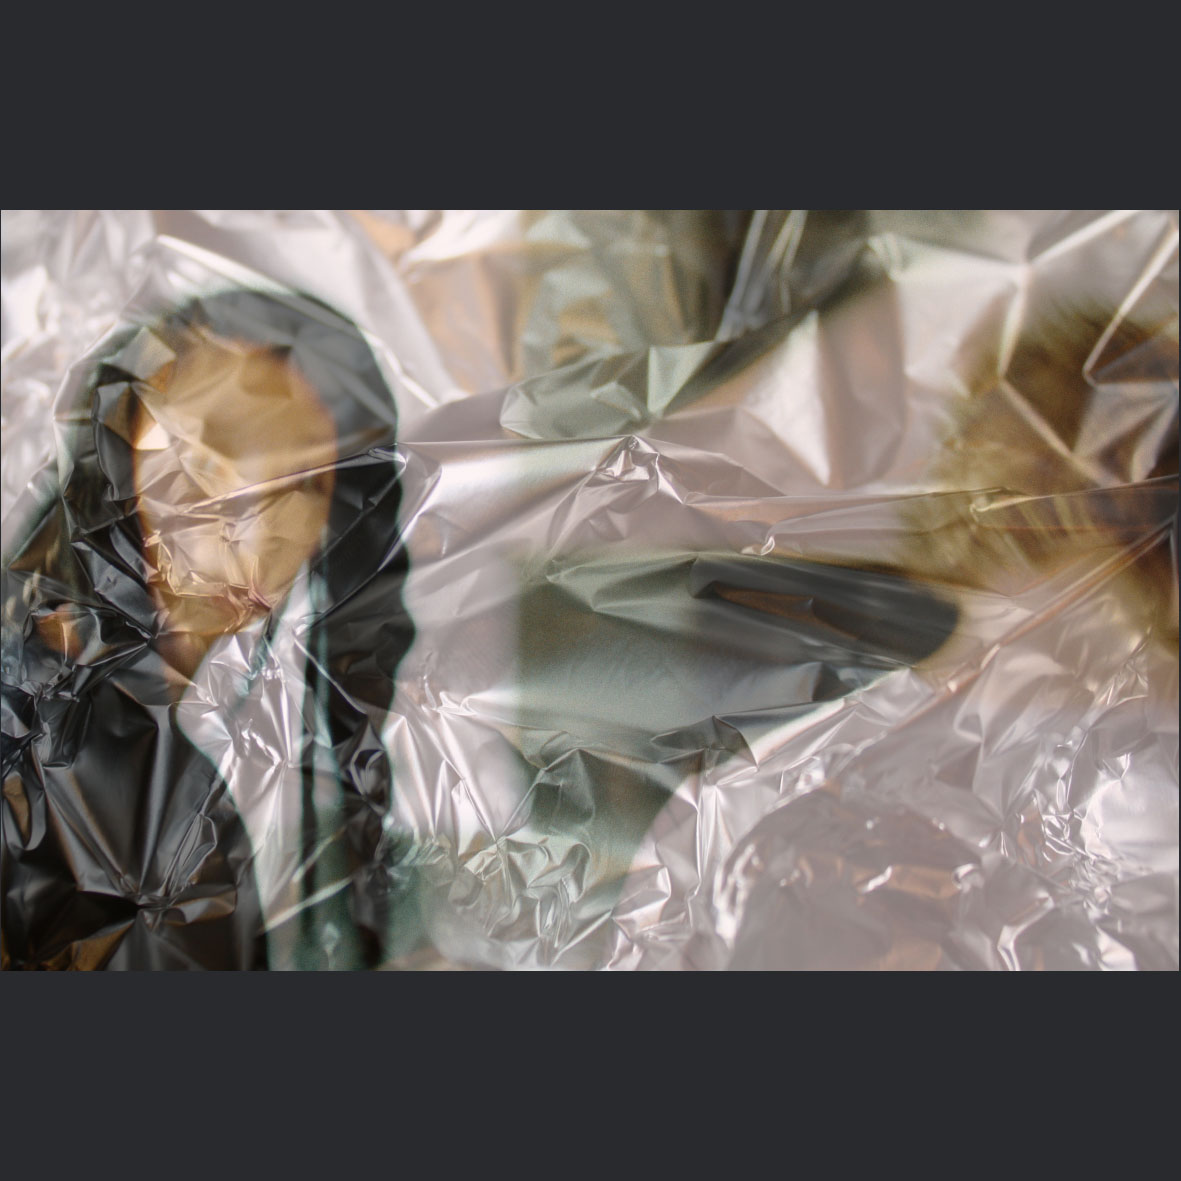 Alma Sissolak Desire 2017 Photographic print 42.5 x 55 cm (framed)